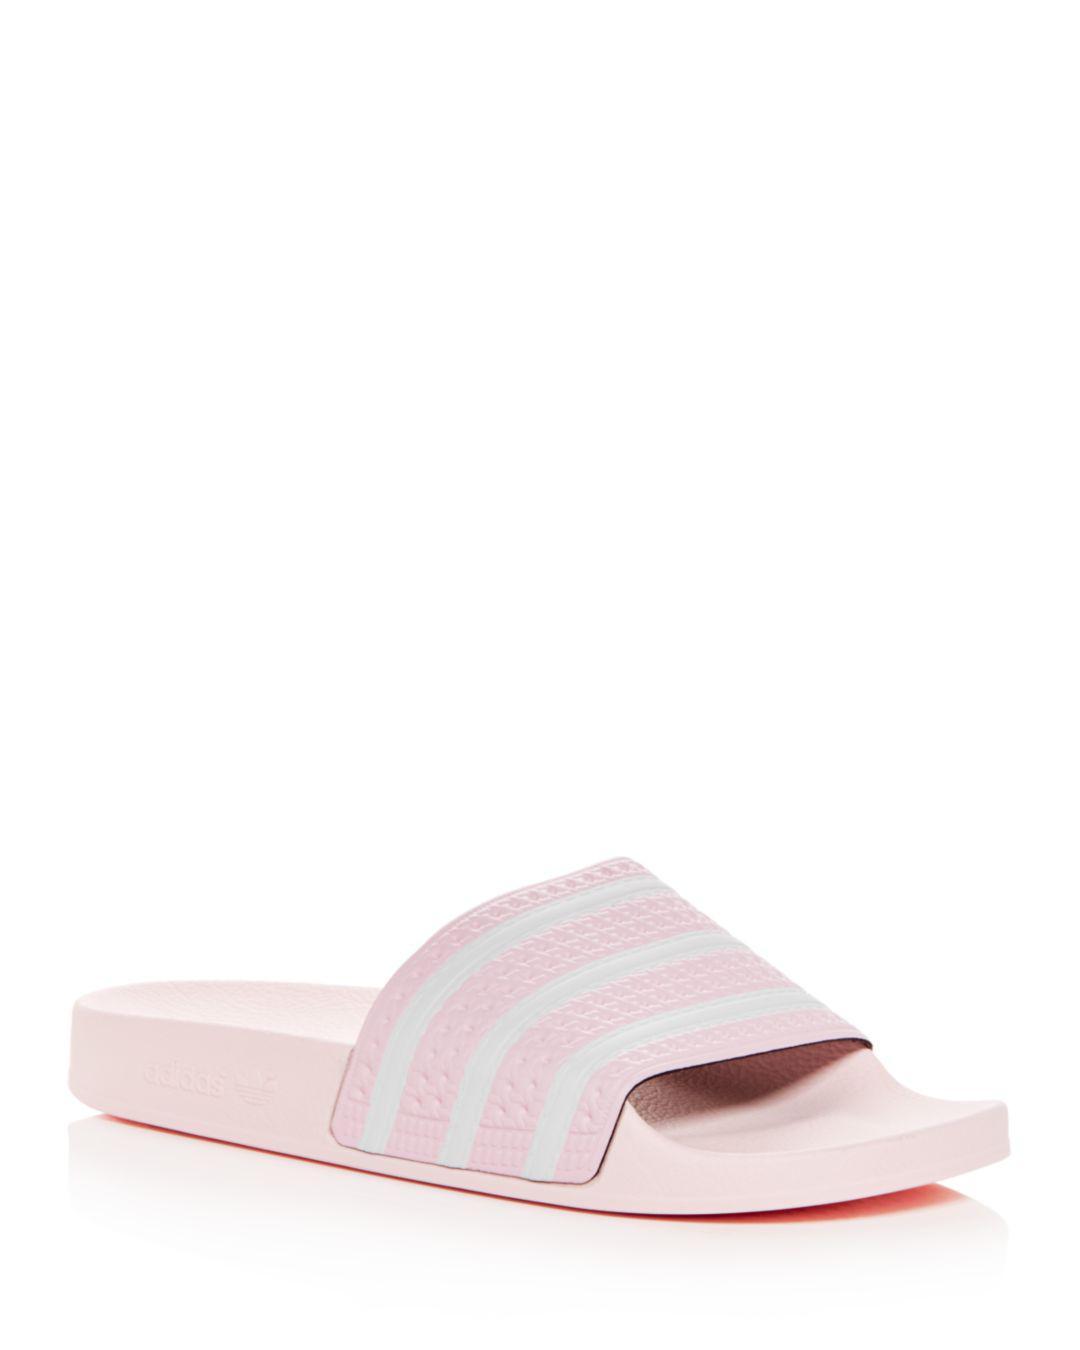 adidas Men s Adilette Slide Sandals in Pink for Men - Lyst 81d171221